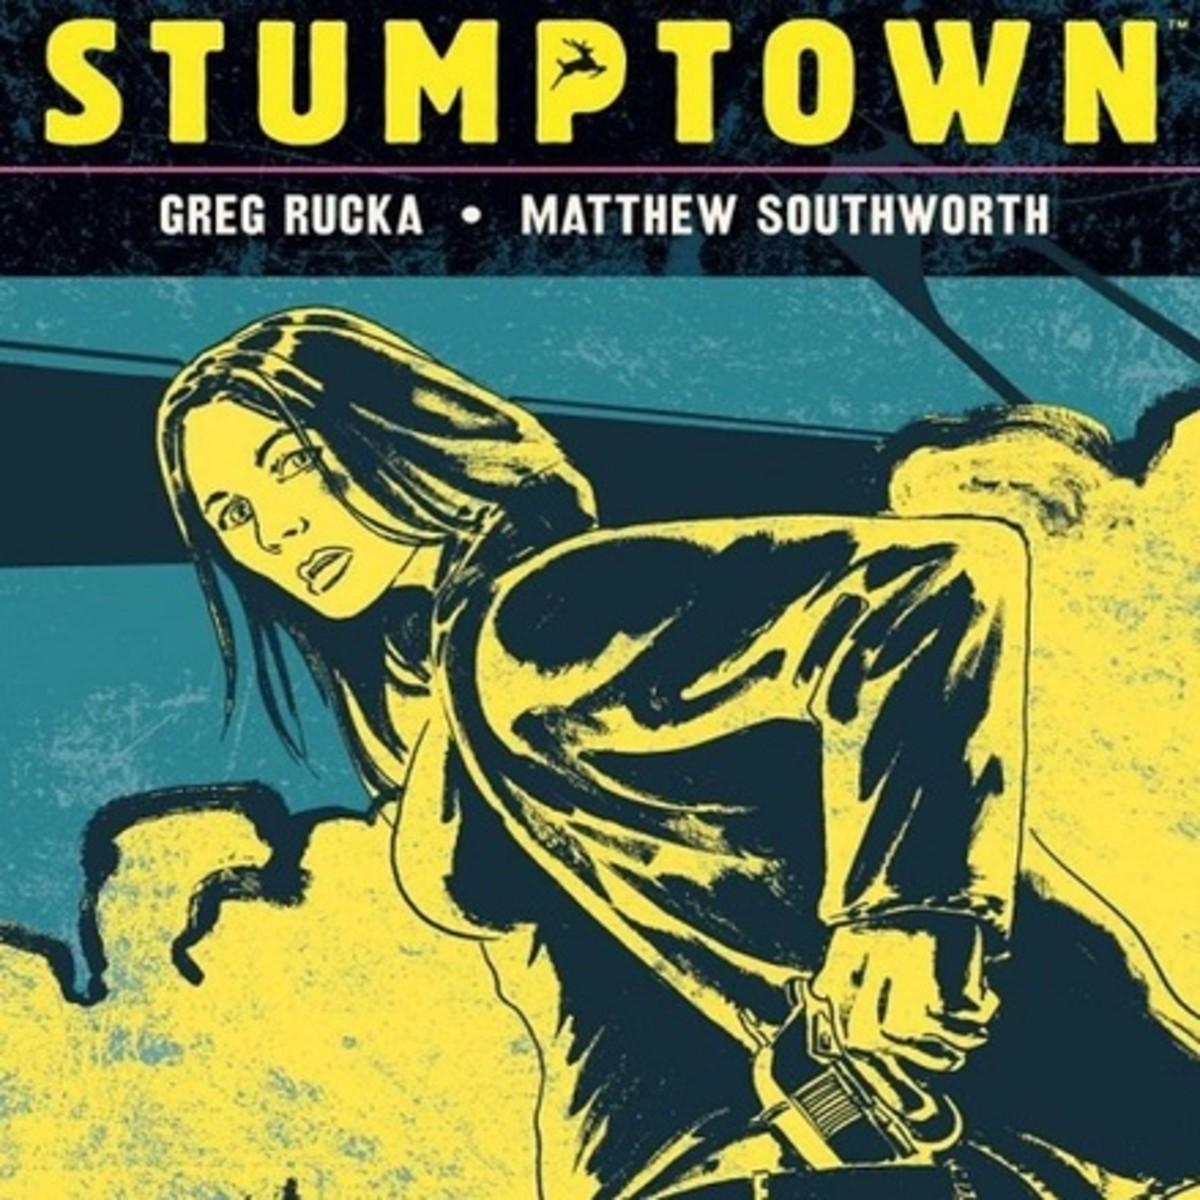 Review of Stumptown, Volume 1